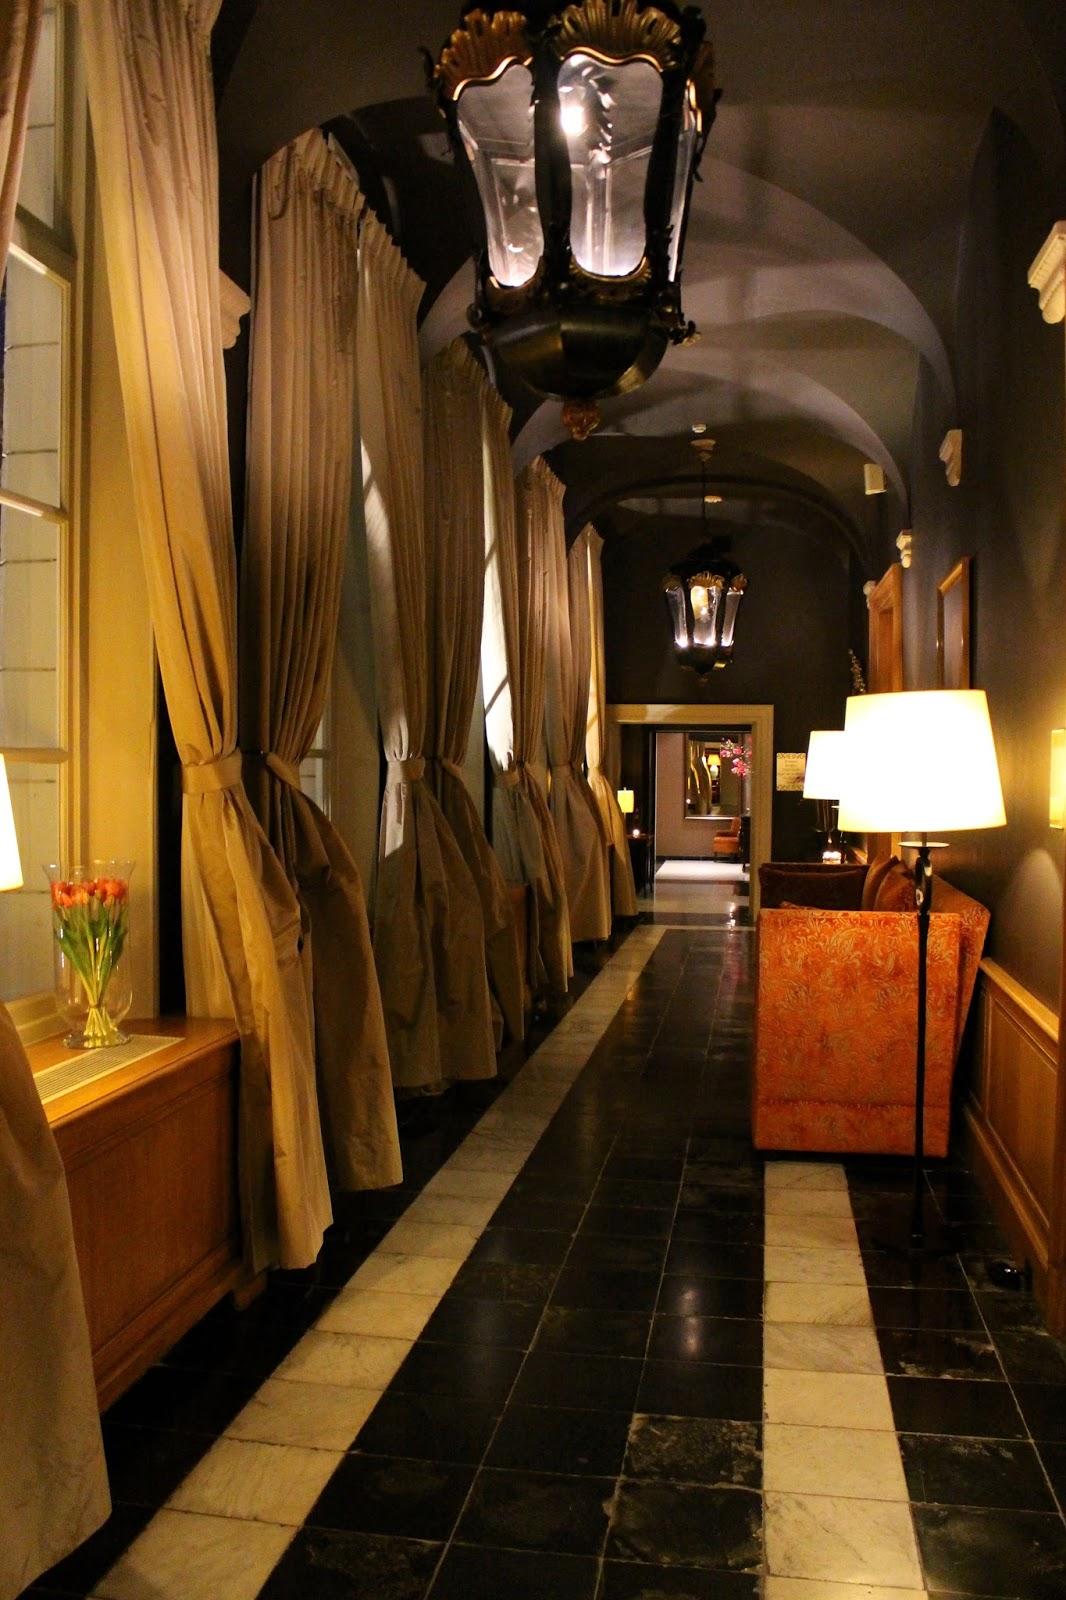 Beautiful hotel dukes' palace corridors by night